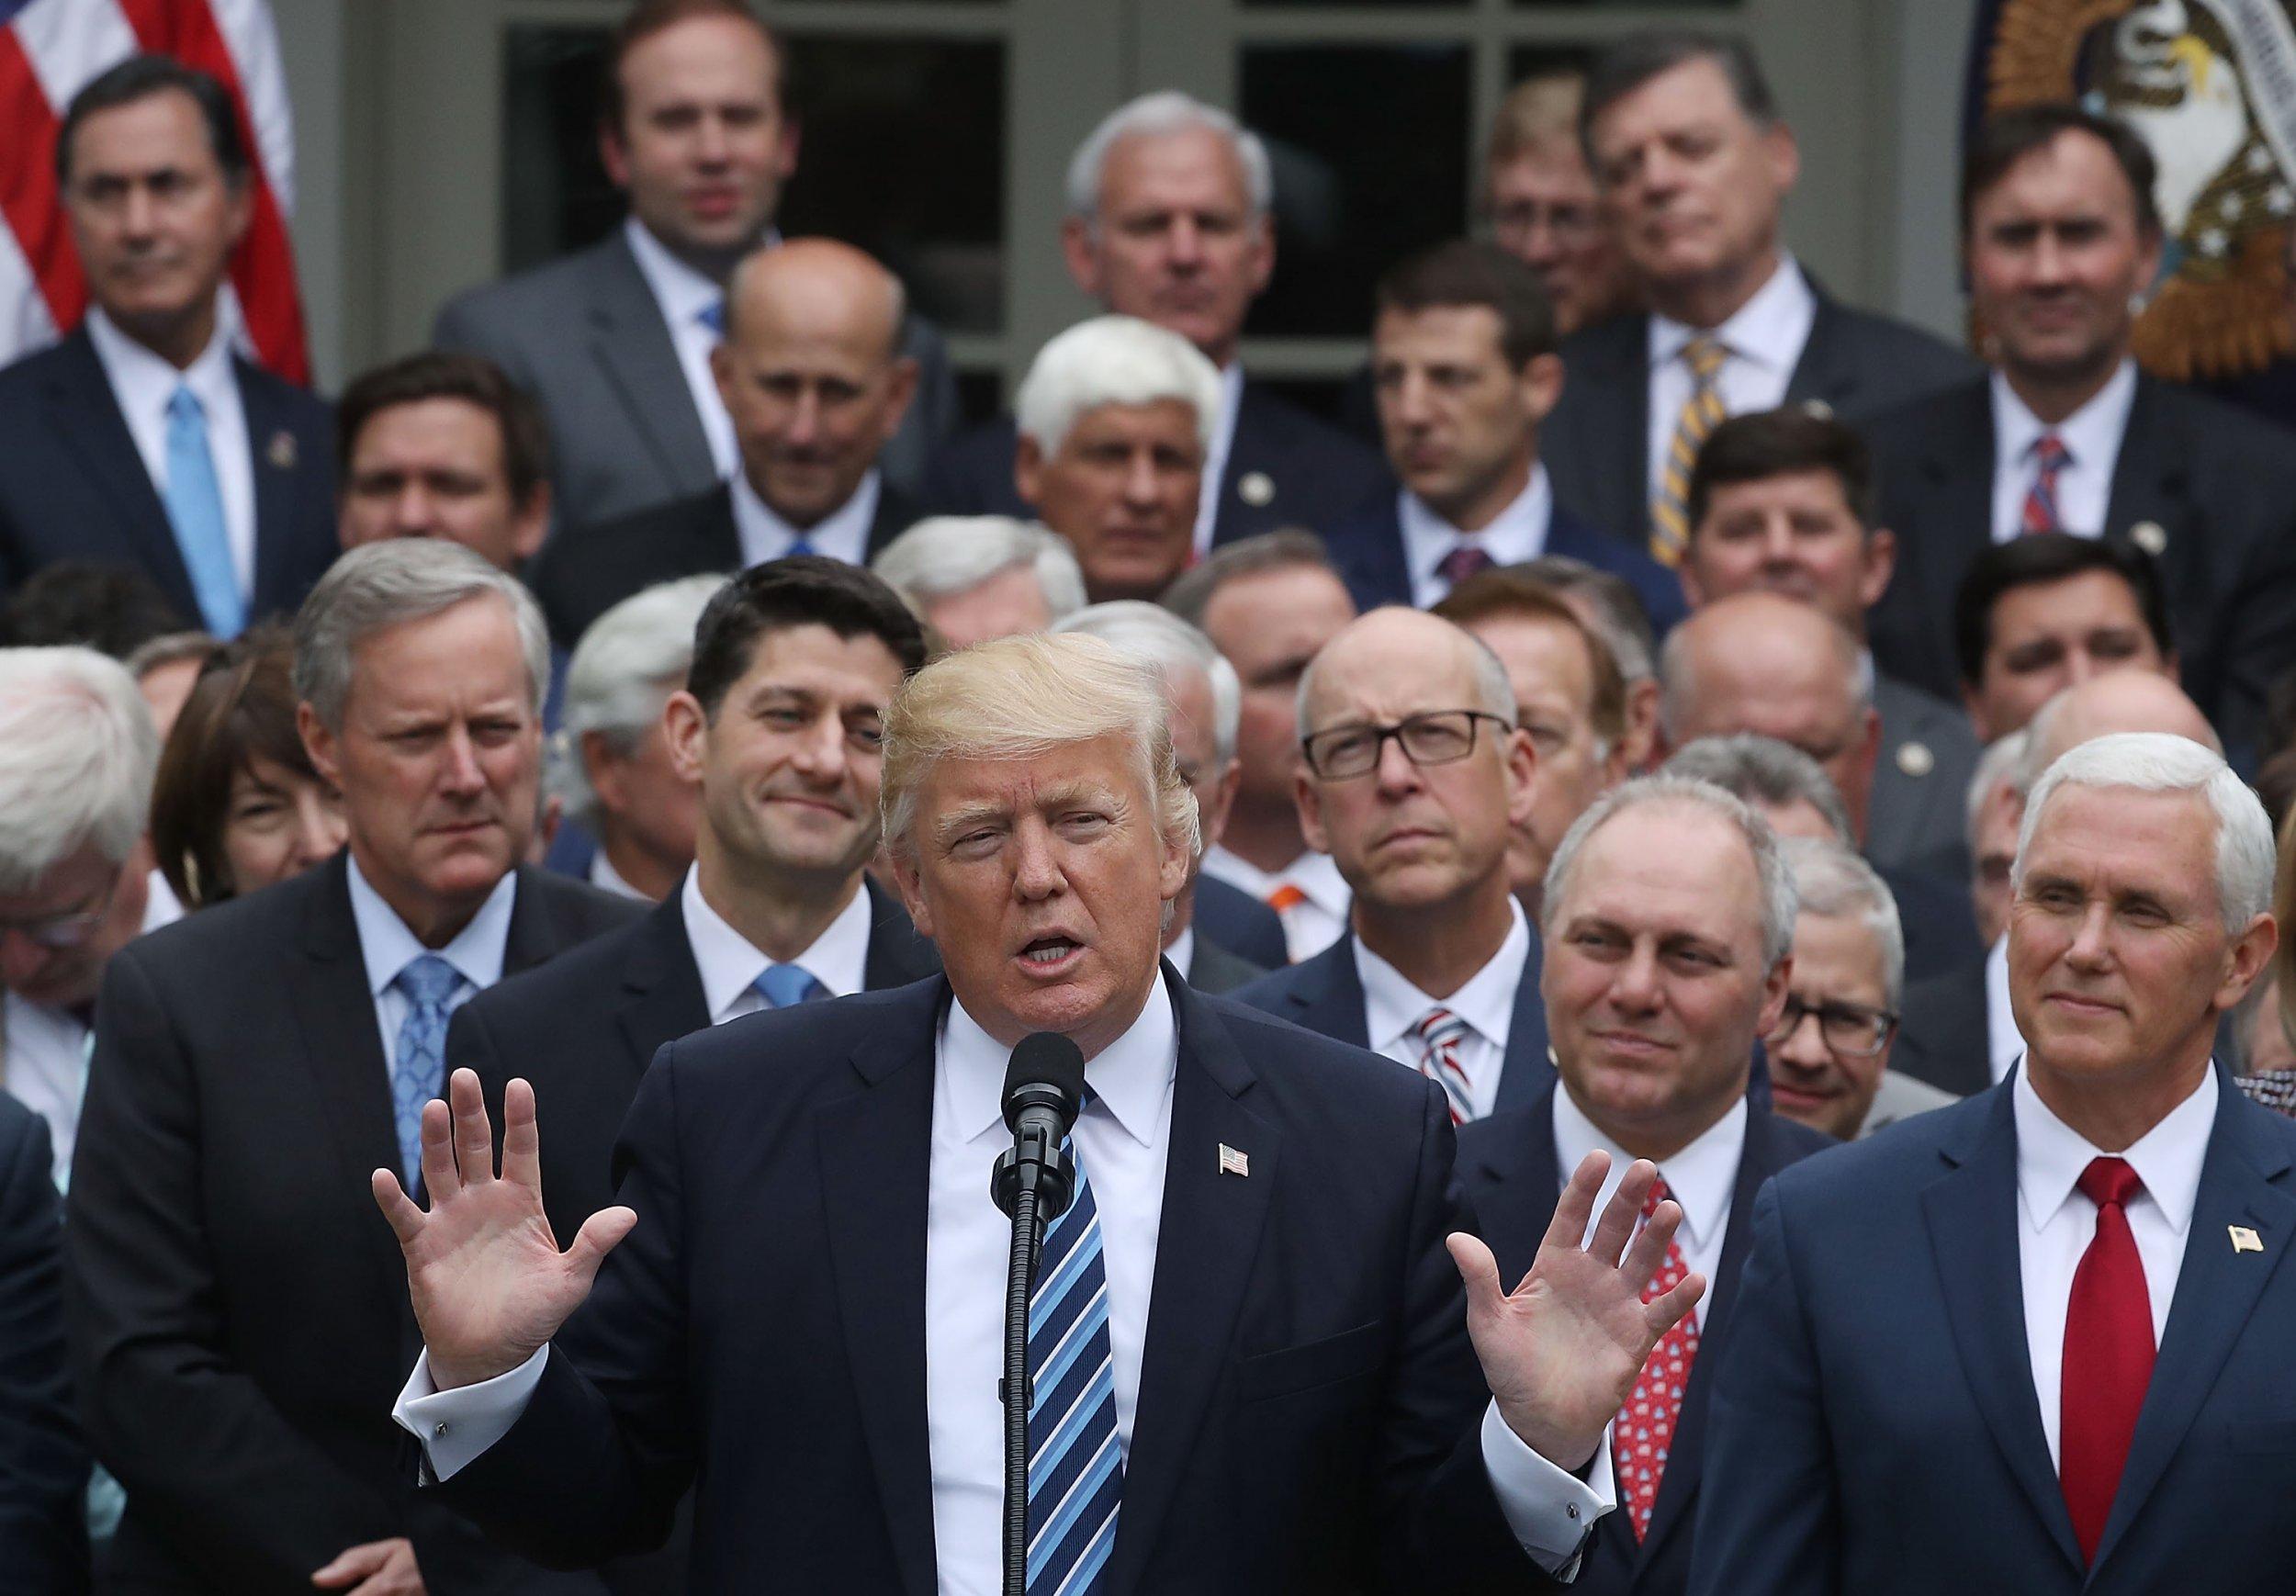 05_14_Trump_Chaos_01